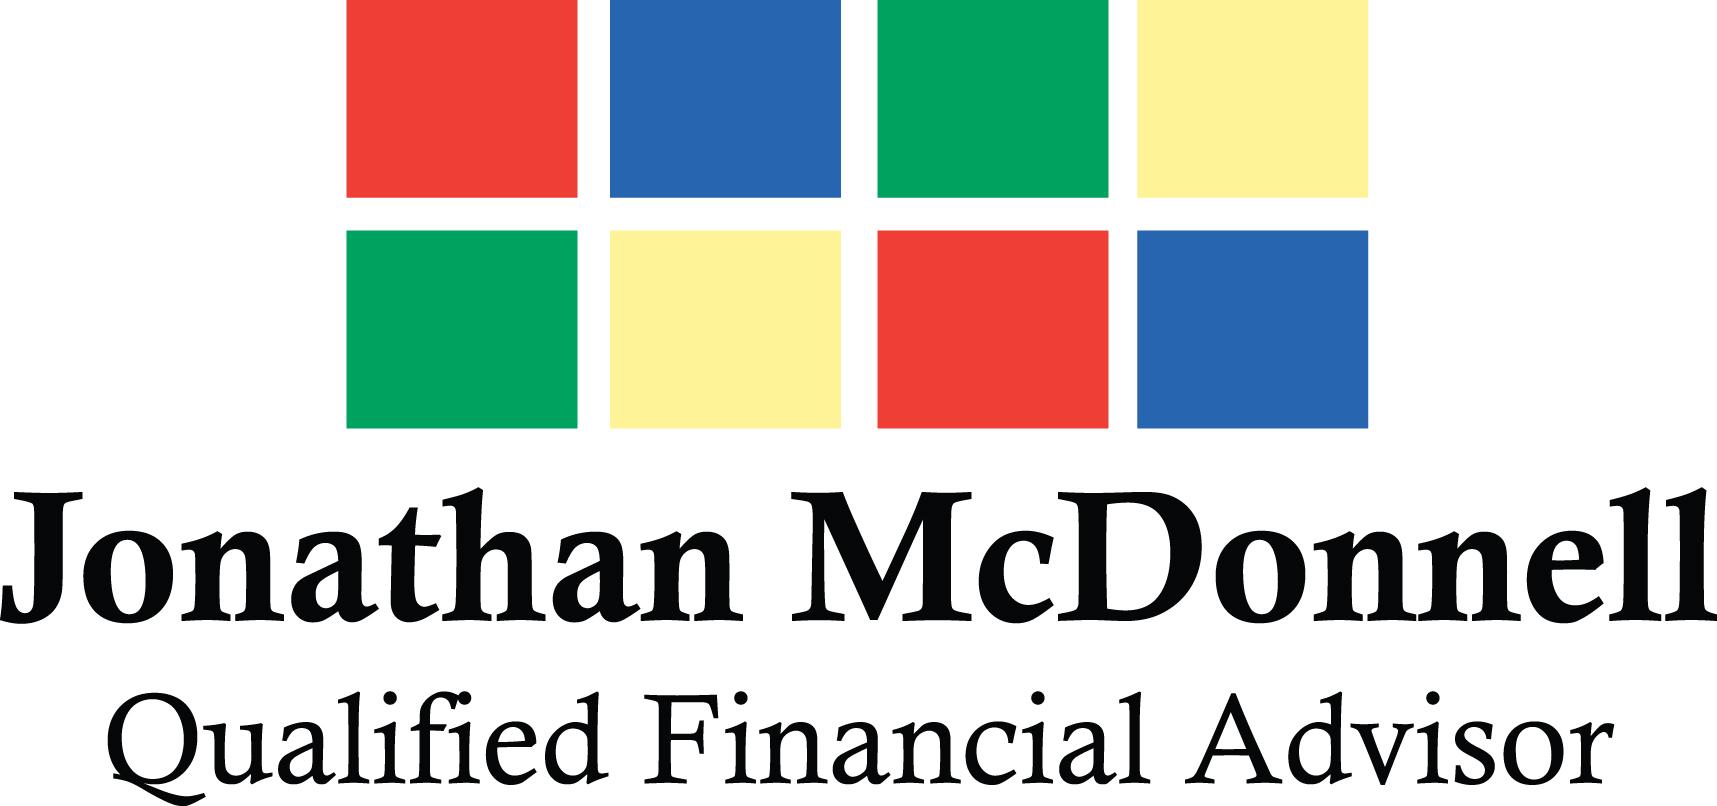 Qualified Financial Advisor